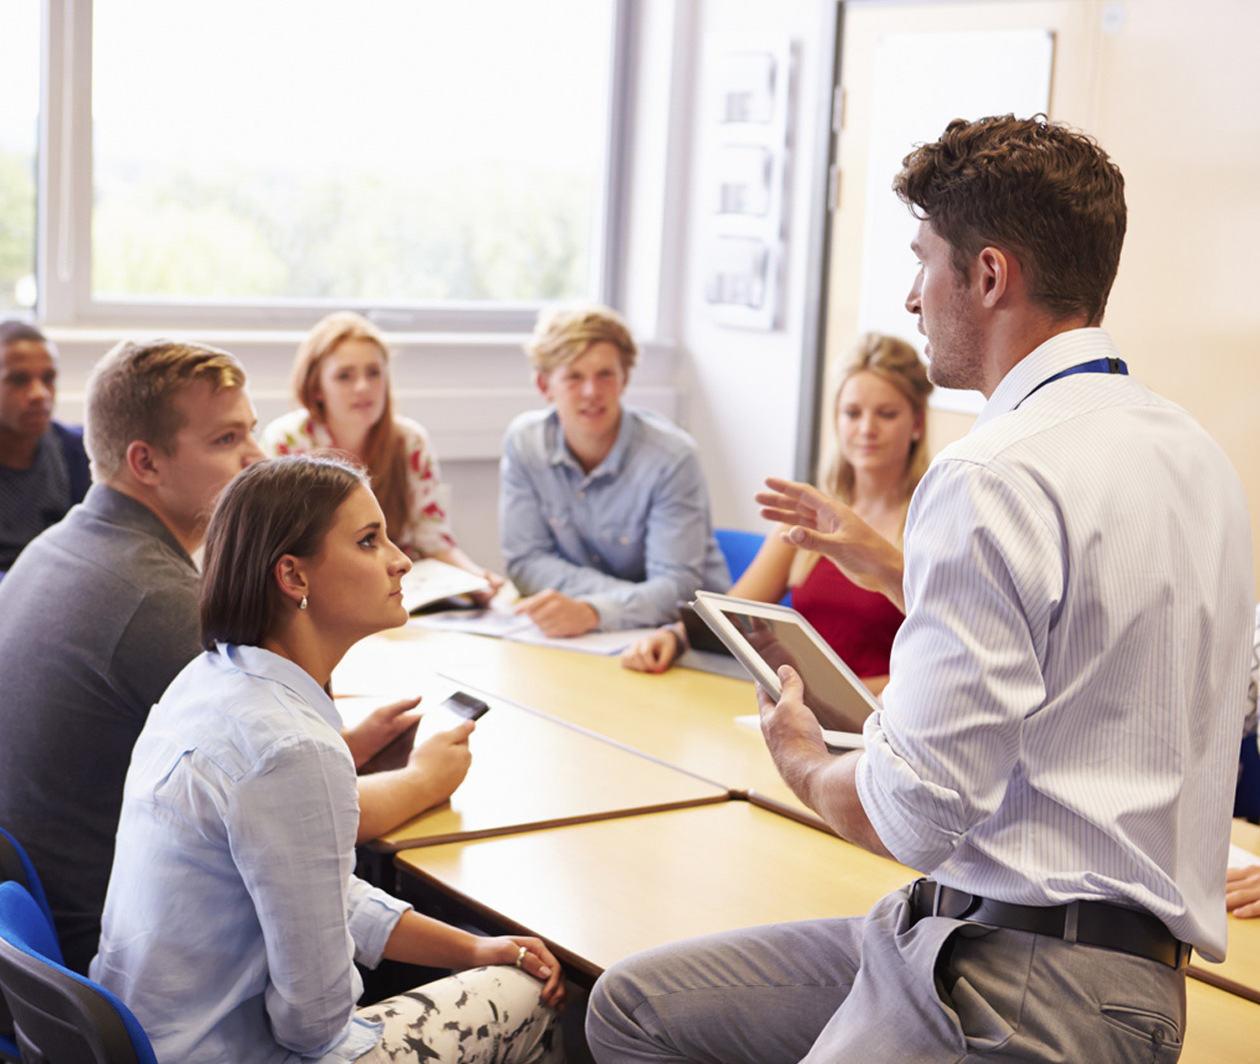 Smart Advice: Broadening Your Students' Horizons